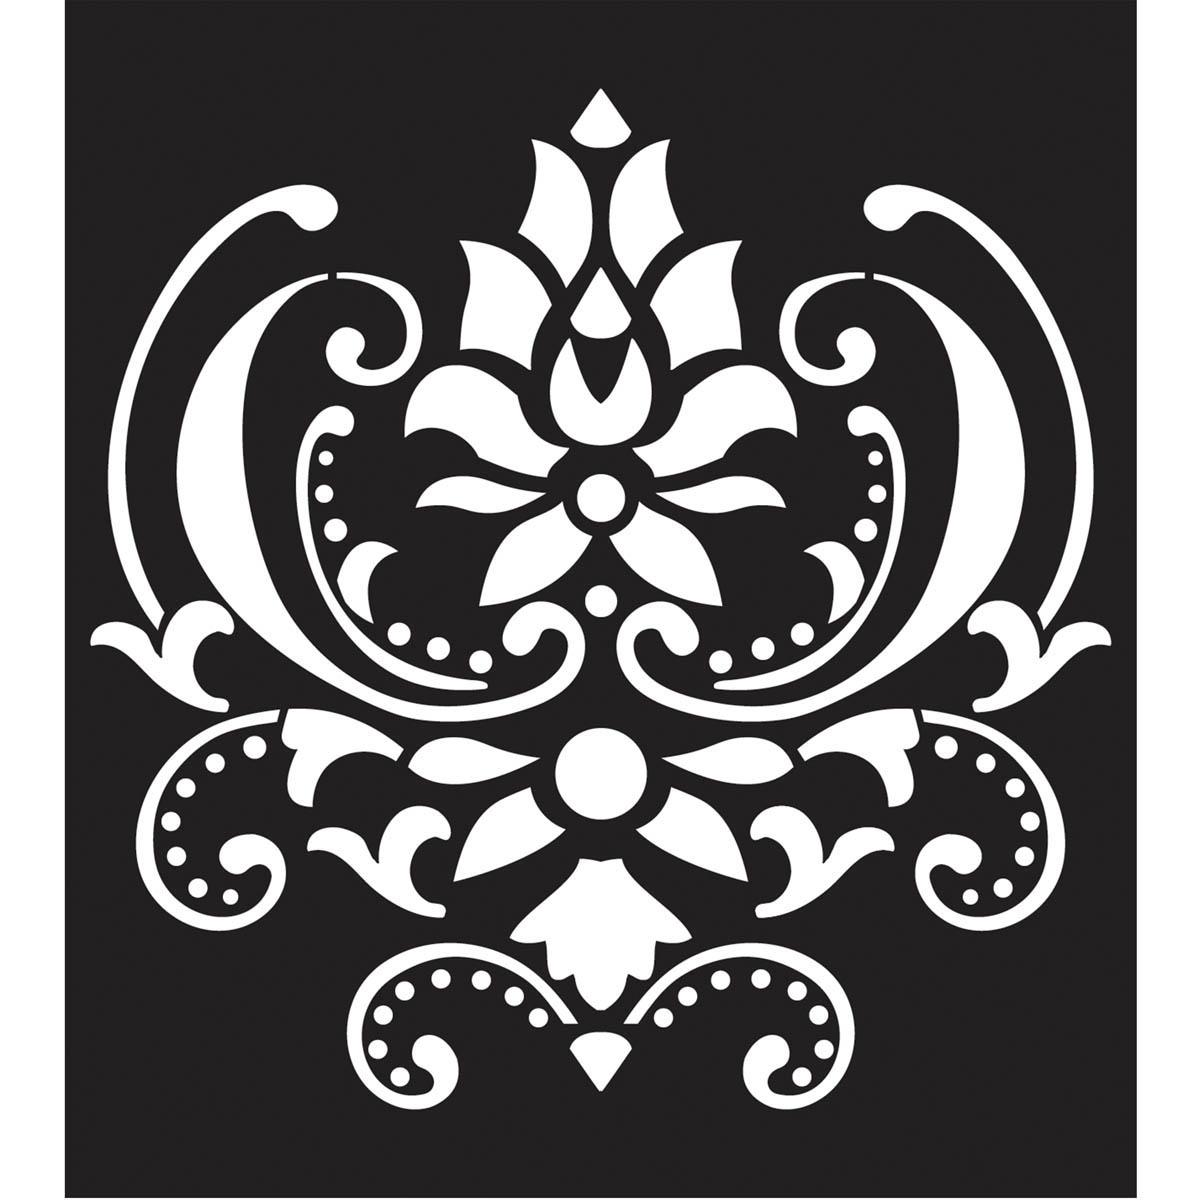 FolkArt ® Painting Stencils - Large - Damask